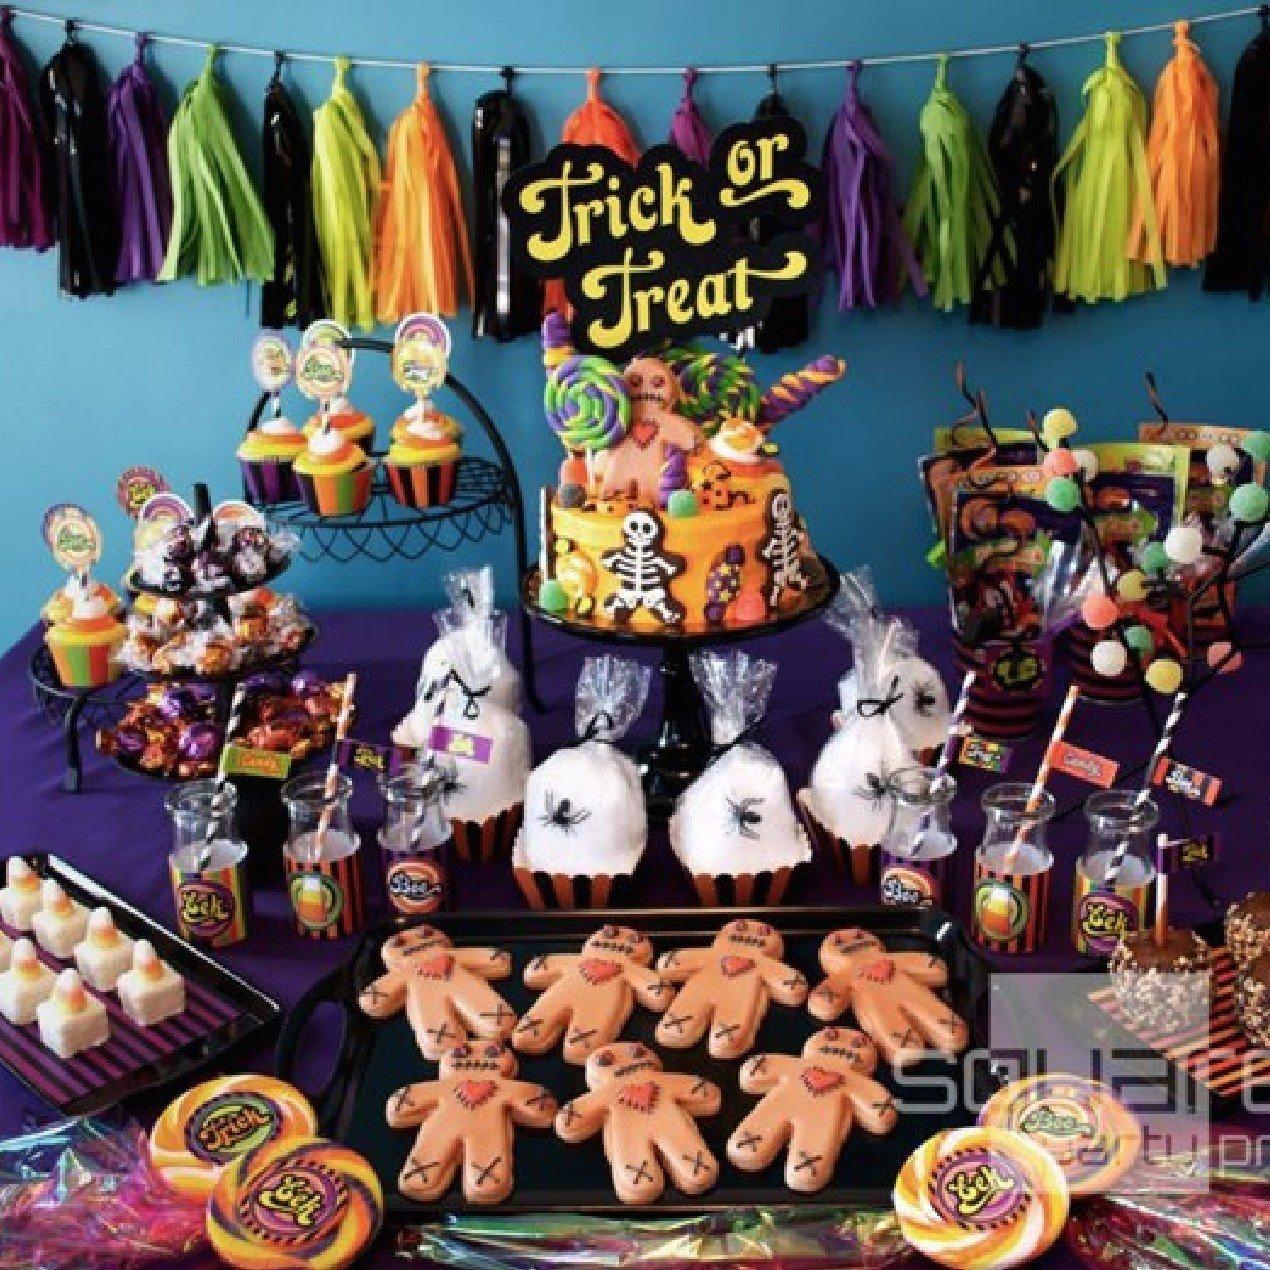 10 Trendy Halloween Birthday Party Ideas For Kids kid friendly halloween party ideas popsugar moms 1 2021